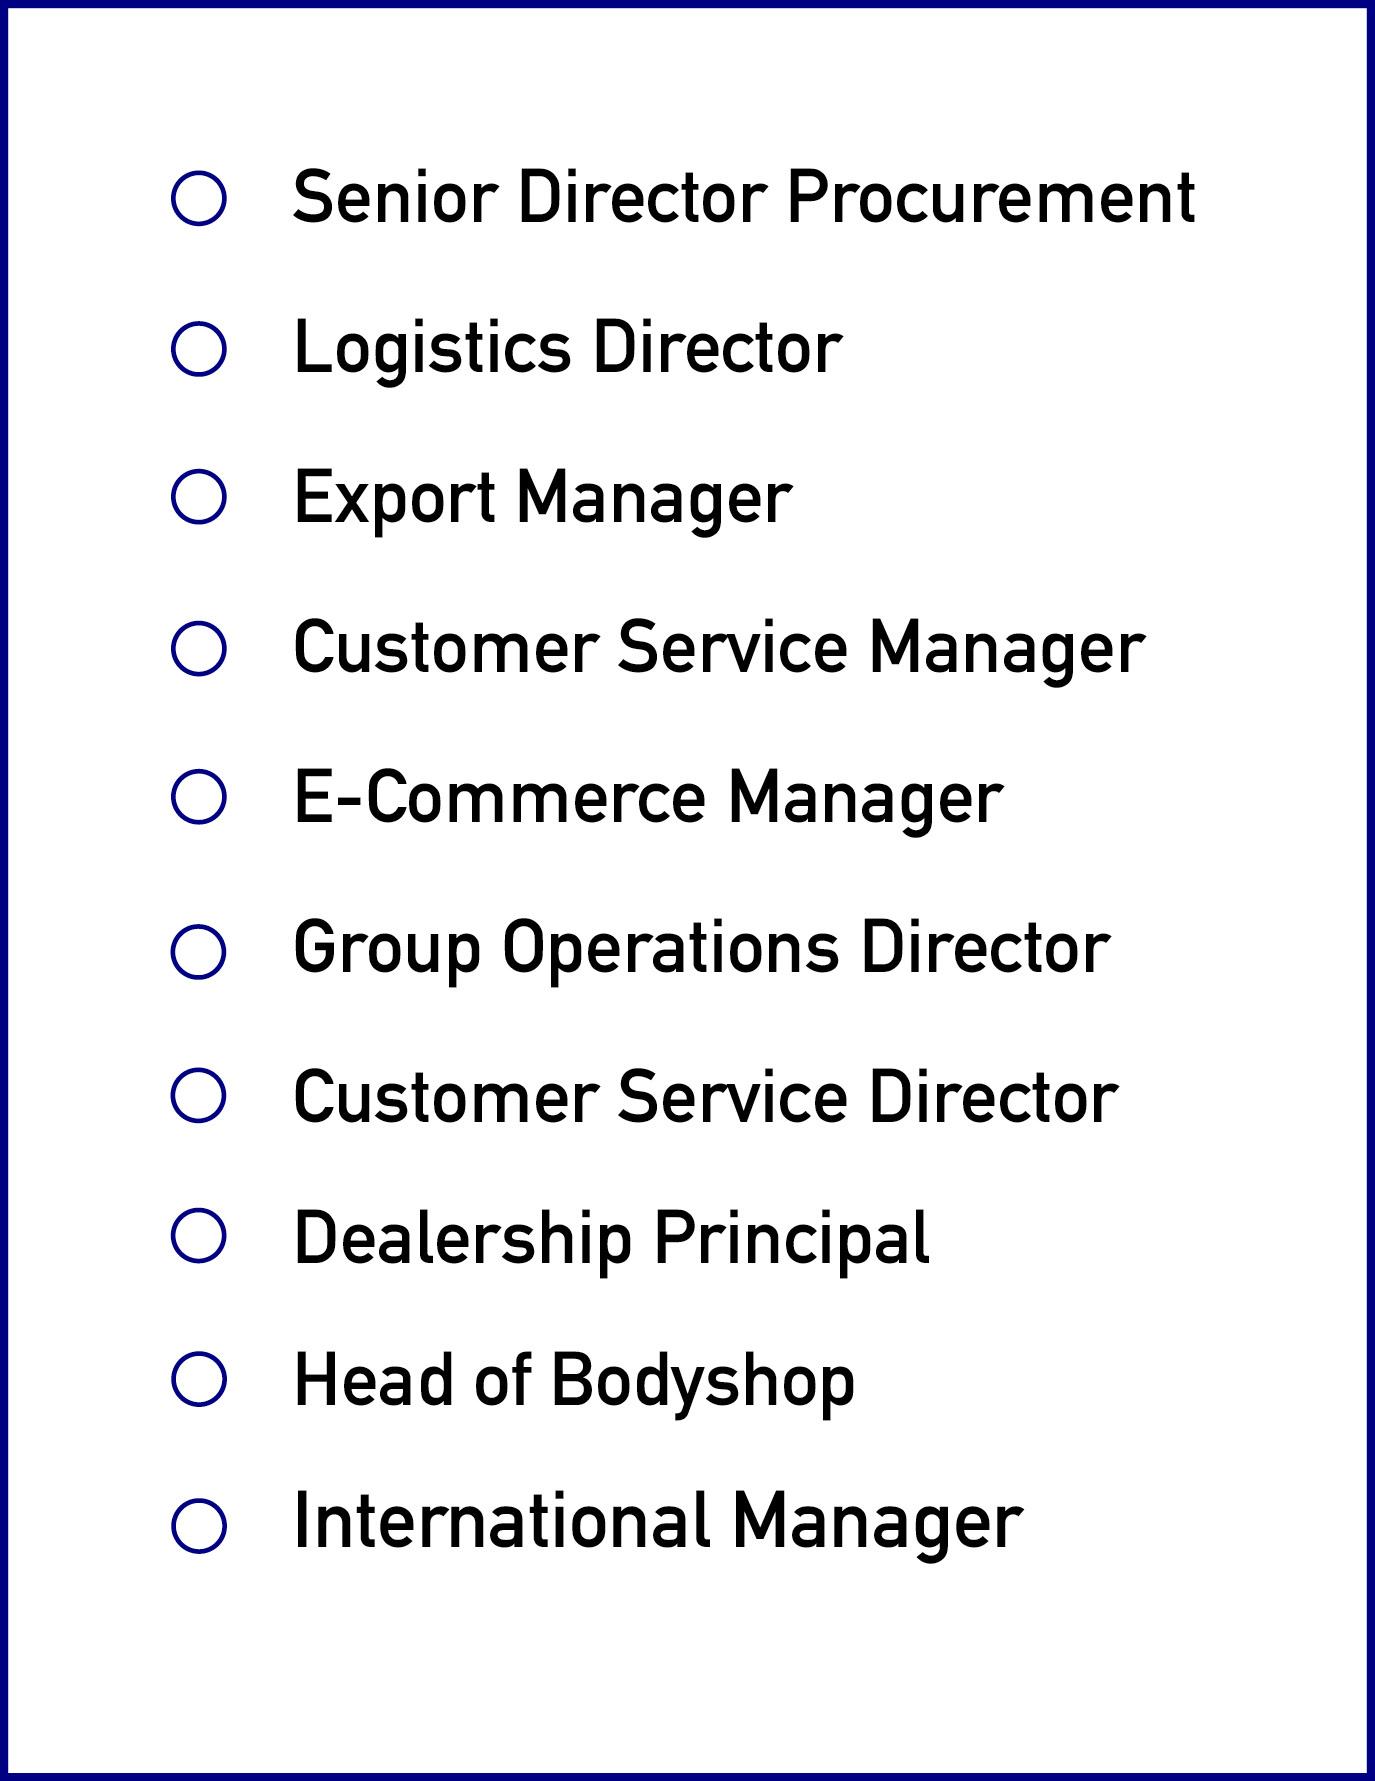 job-titles3.jpg